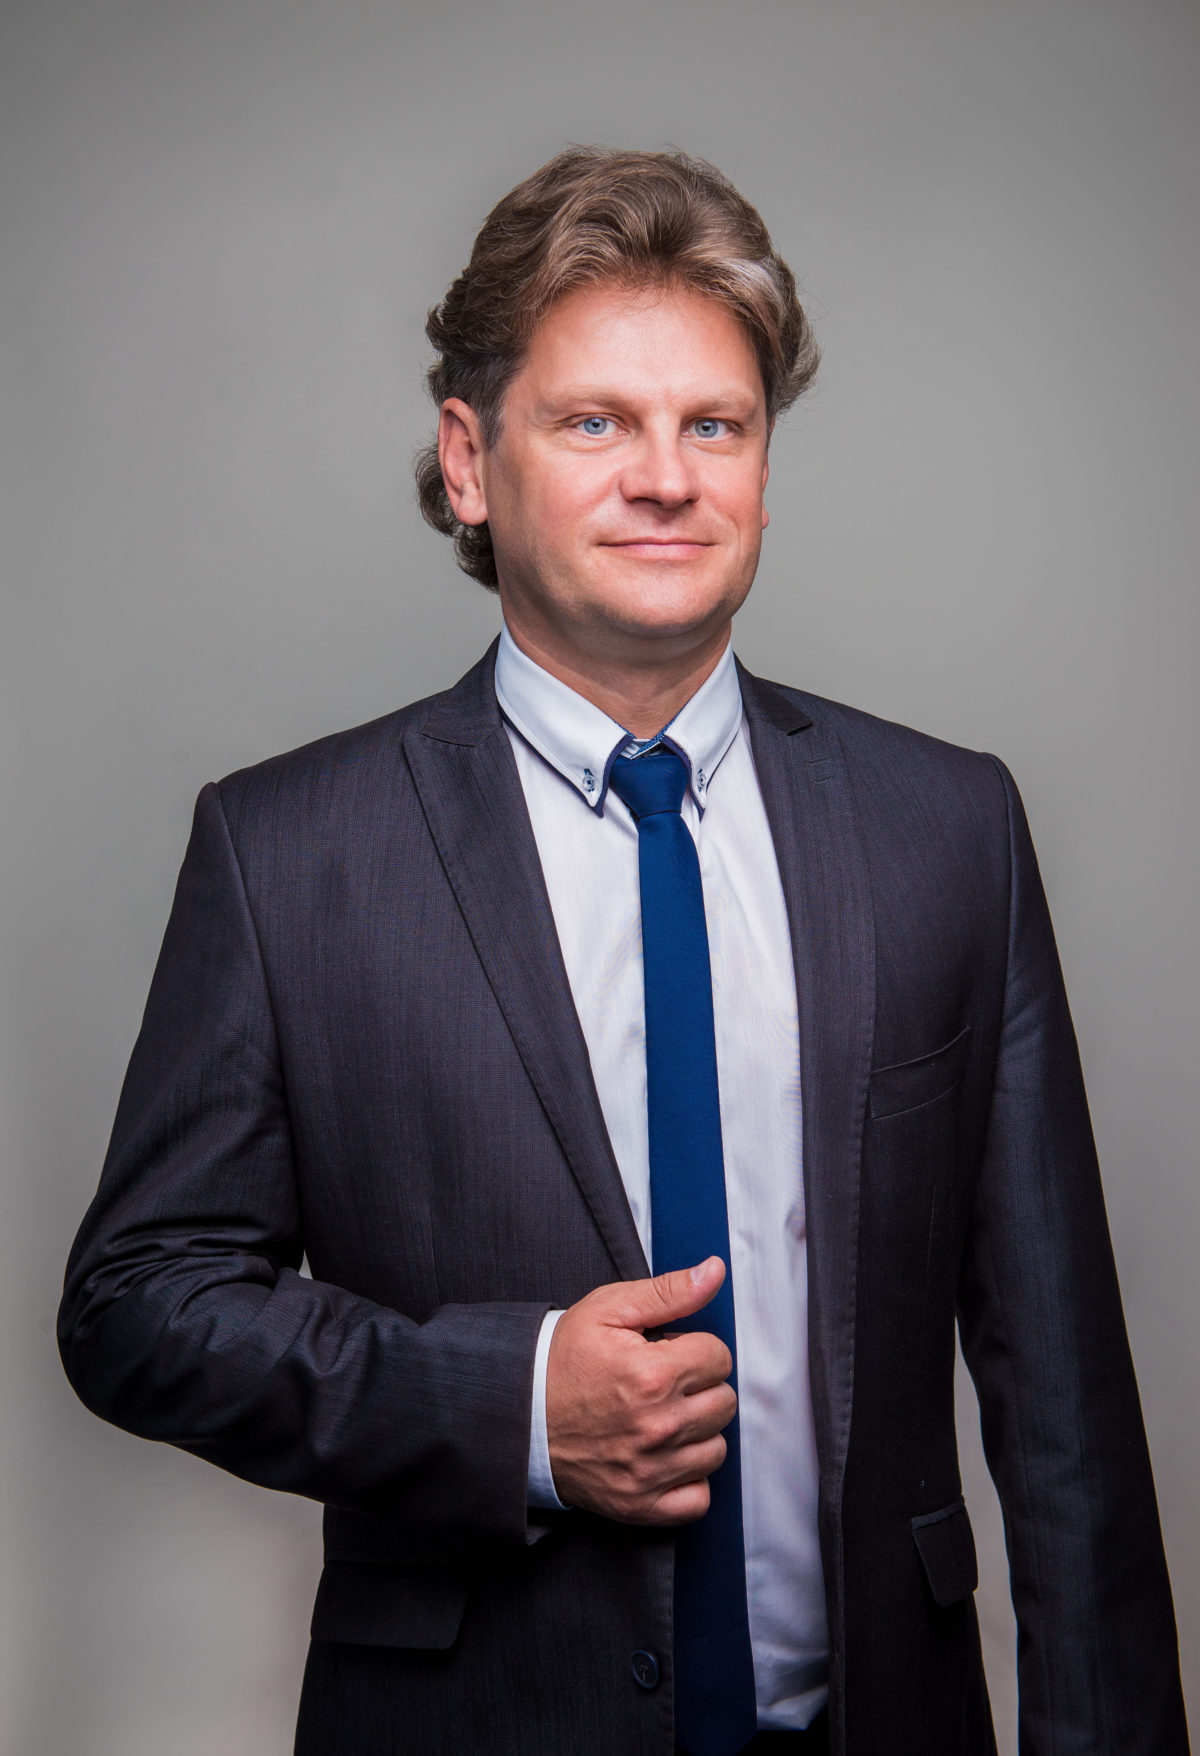 Tomasz Marzęda